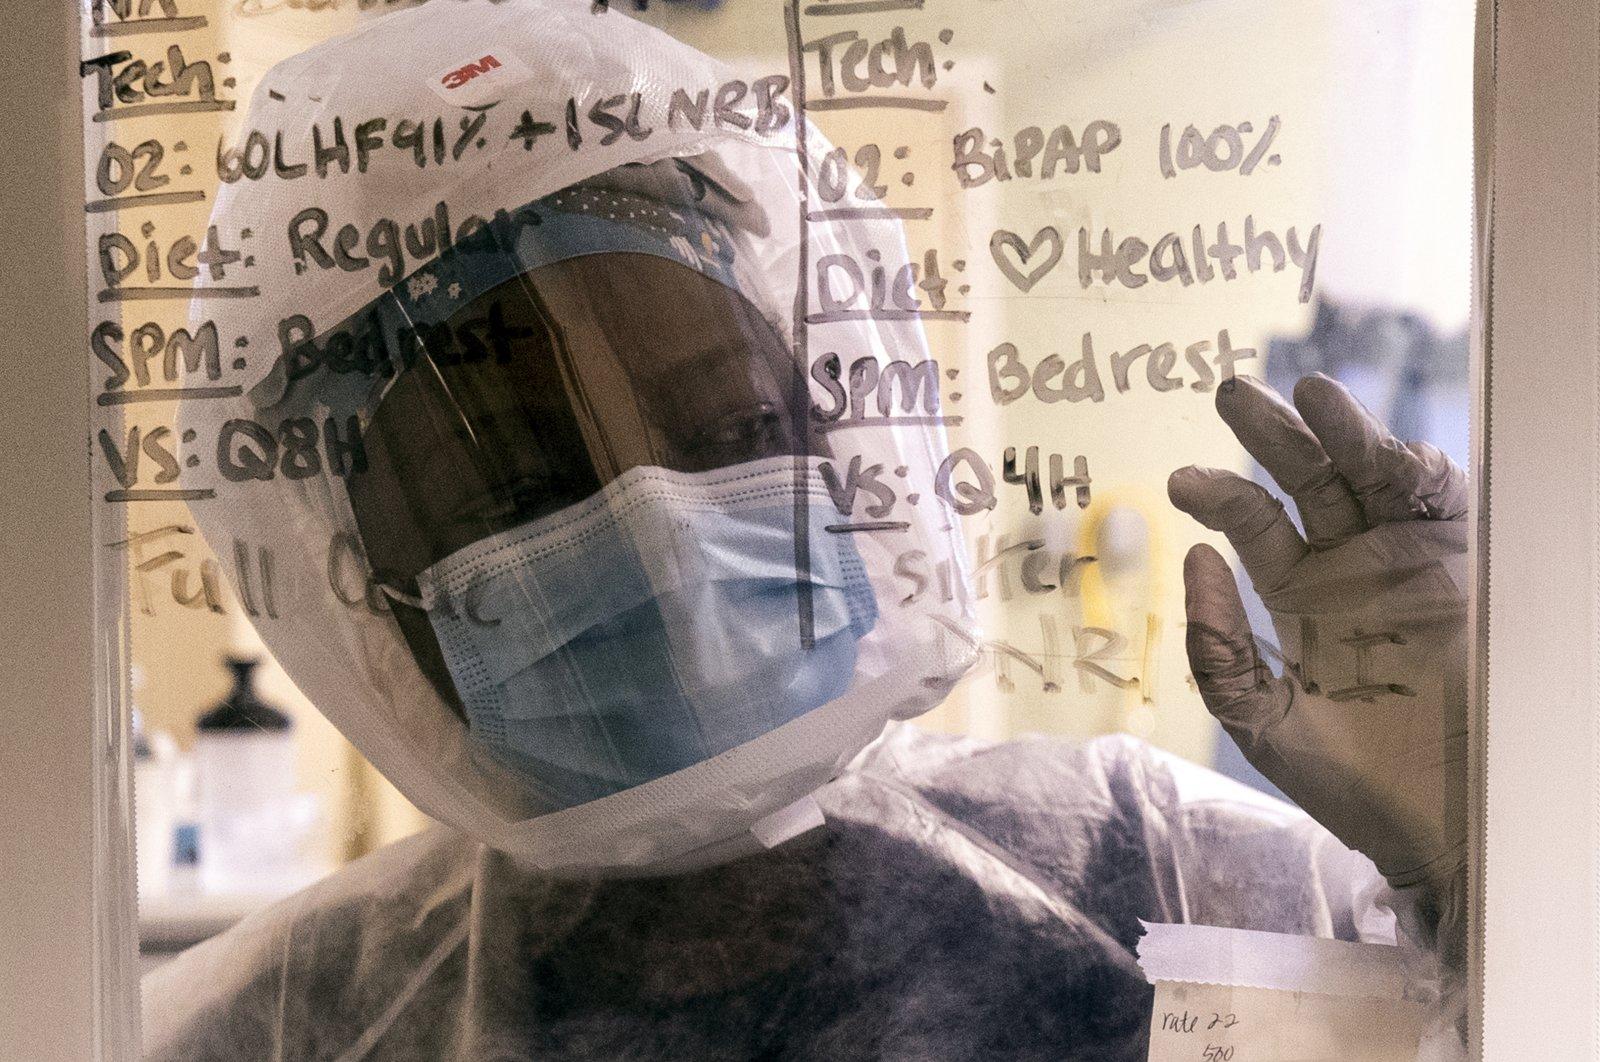 Nurse Ann Lawani looks through the window of a COVID-19 patient's room in the ICU, San Diego, California, U.S., Jan. 20, 2021. (EPA-EFE Photo)